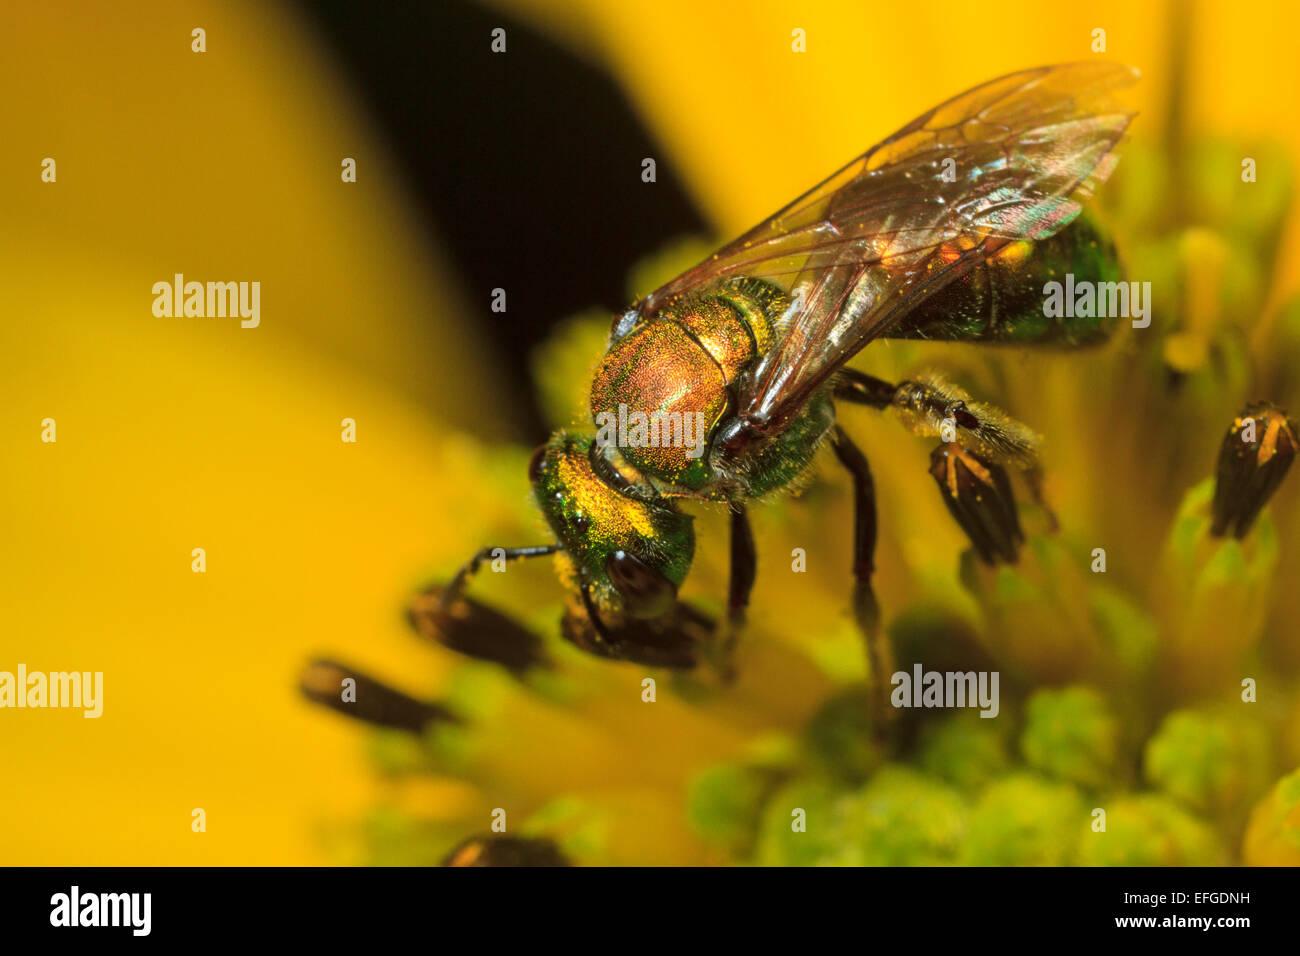 Green metallic sweat bee (Halictidae sp.) on a flower. - Stock Image